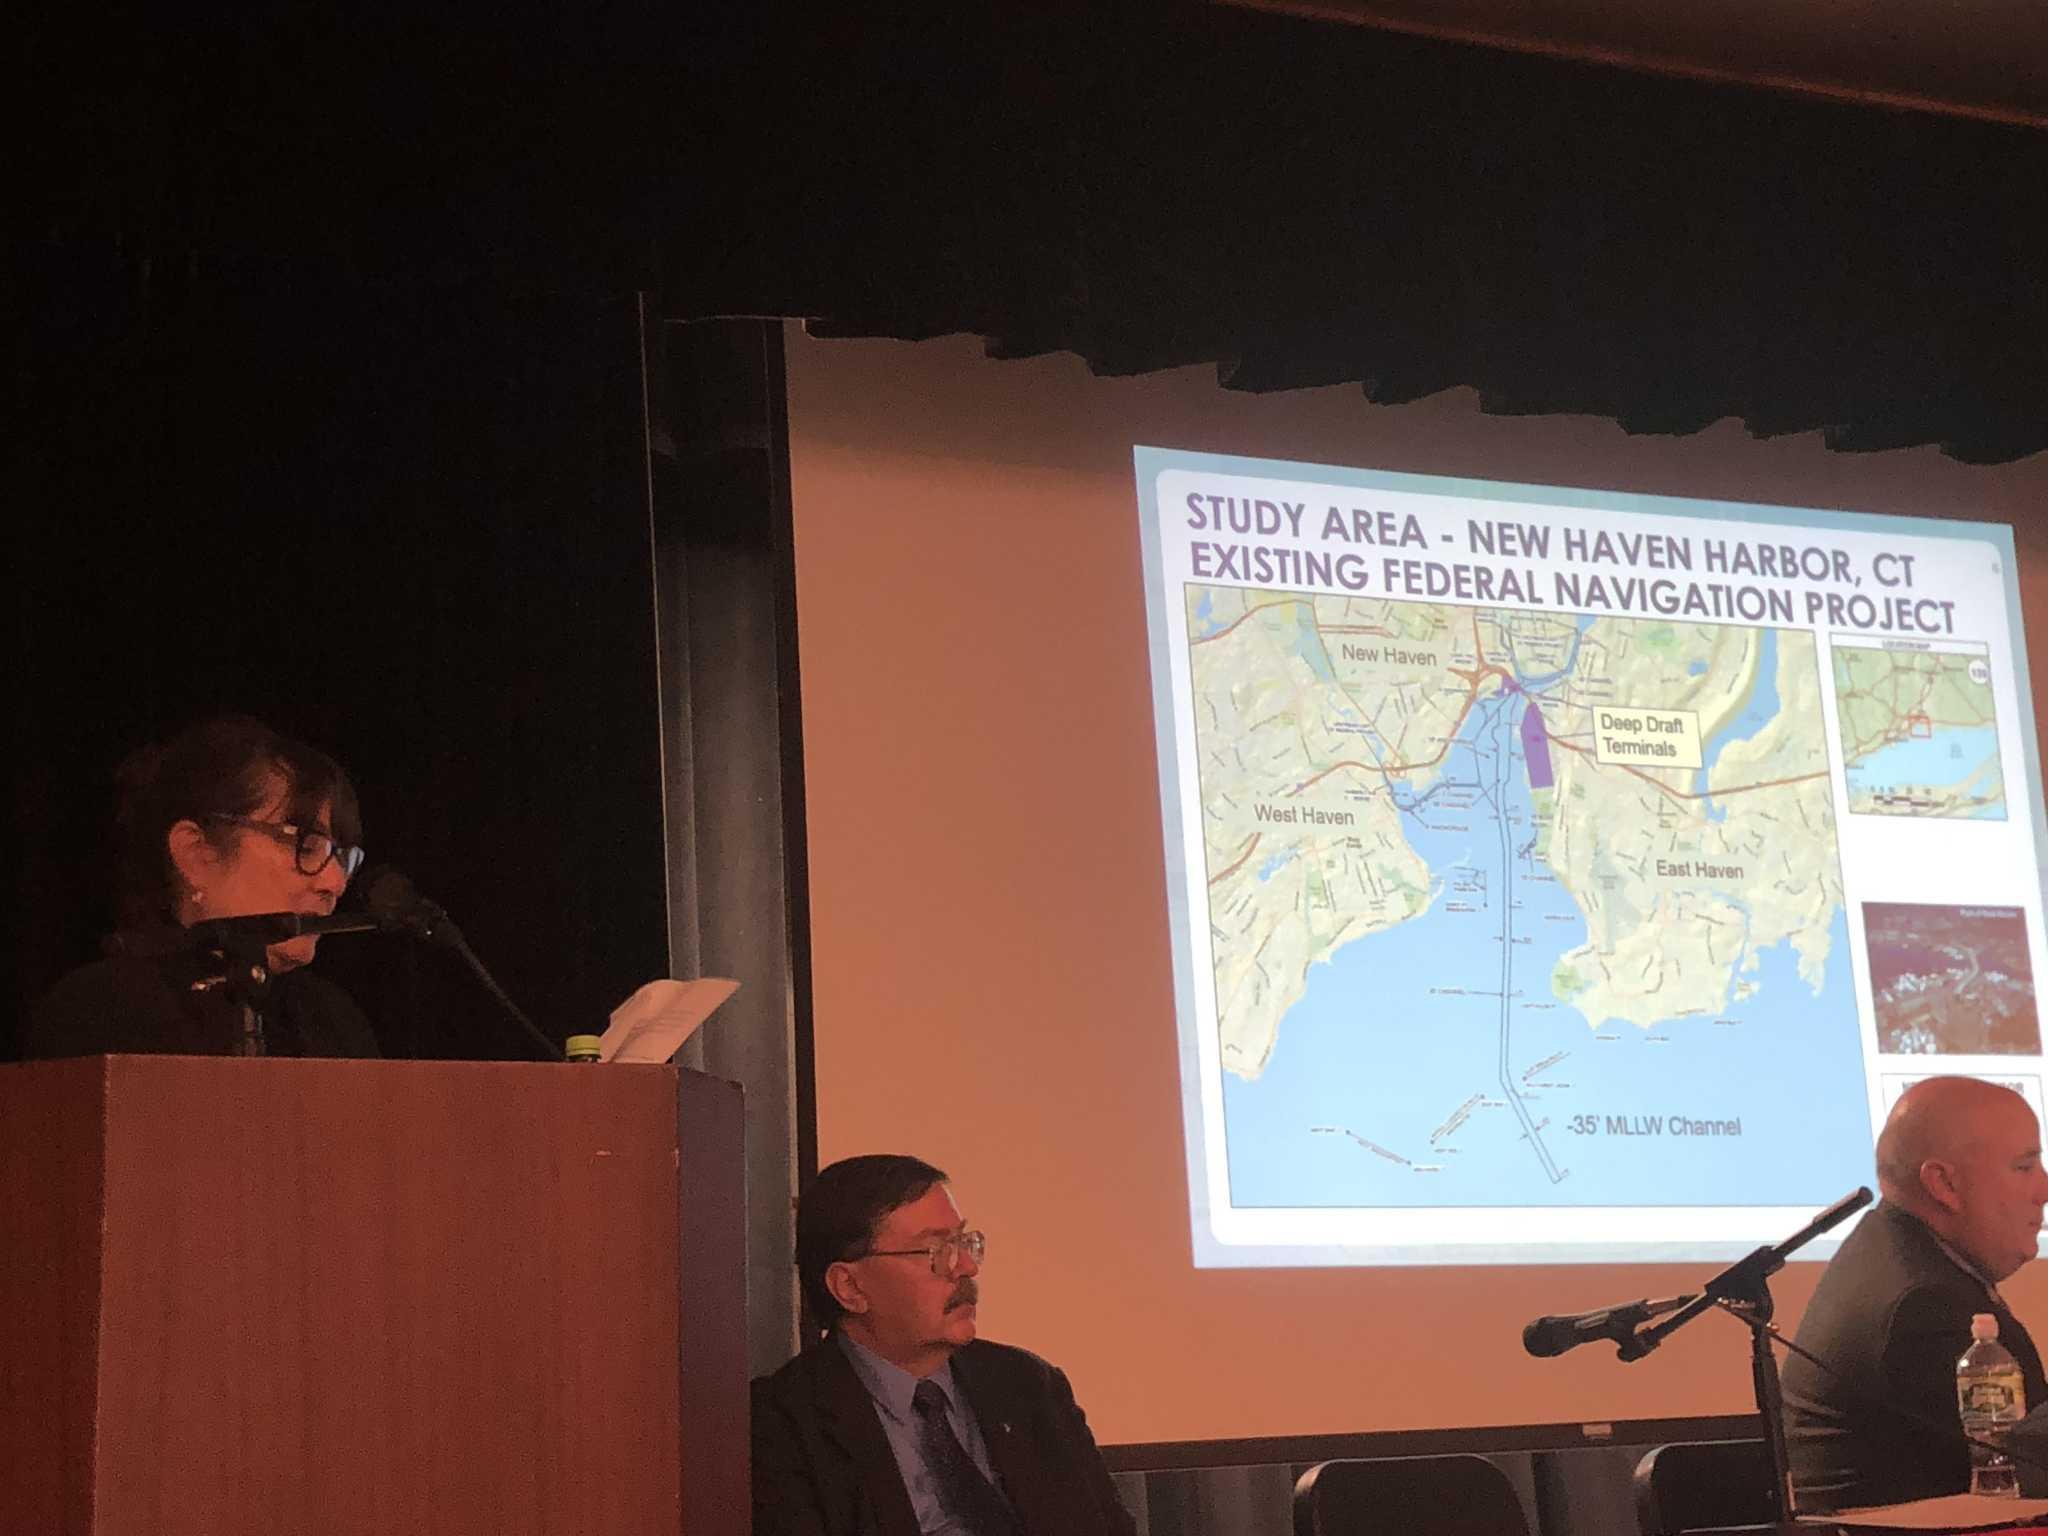 Draft plan would dredge harbor channel 5 feet deeper, 100 feet wider